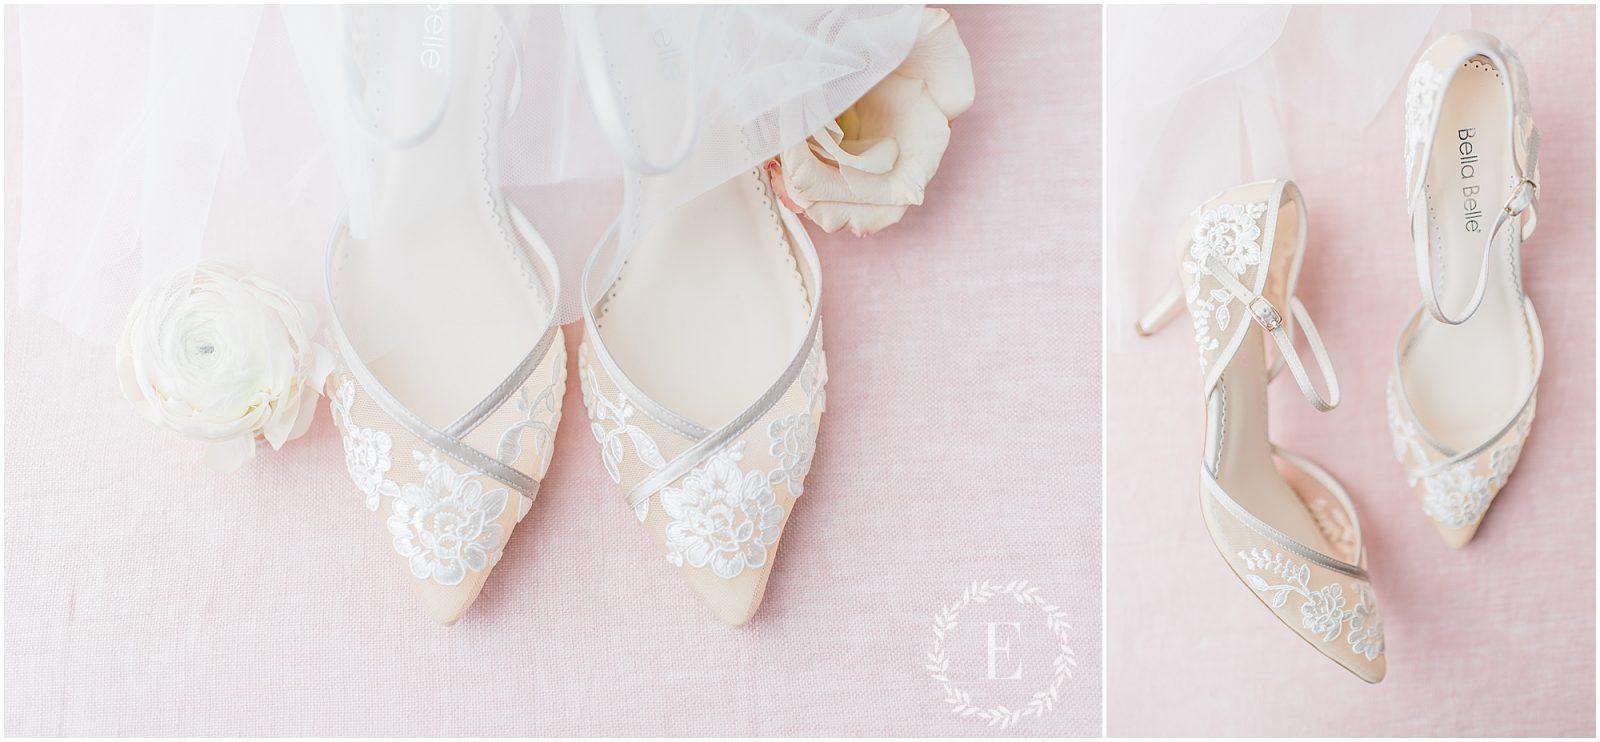 27 - Bella Belle for Fairy Dreams Bridal - PhotosbyEmmaH 2019.jpg